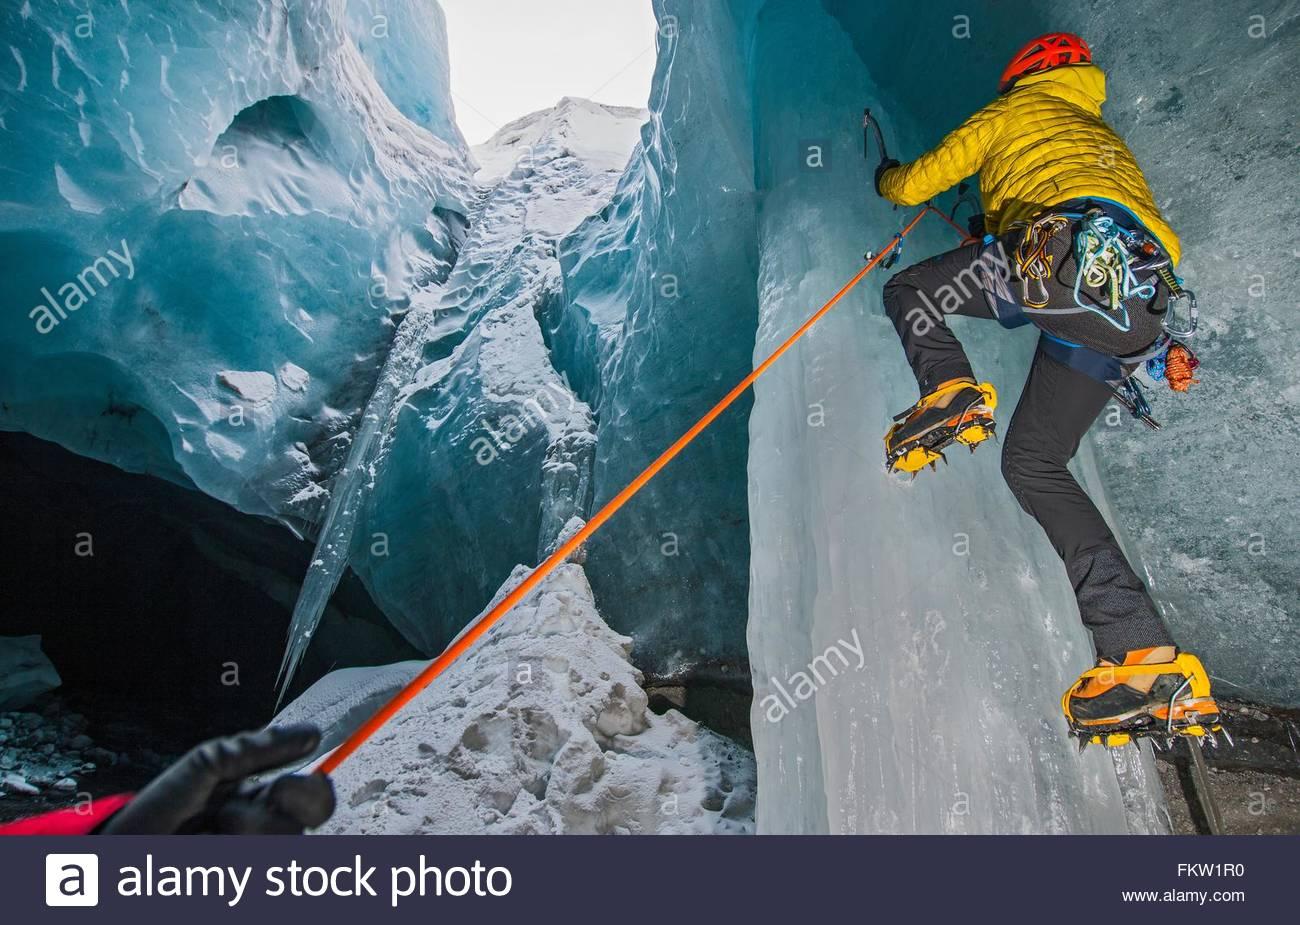 Eiskletterer Klettern auf Eis Höhle unterhalb des Gigjokull-Gletschers, Thorsmork, Island Stockbild